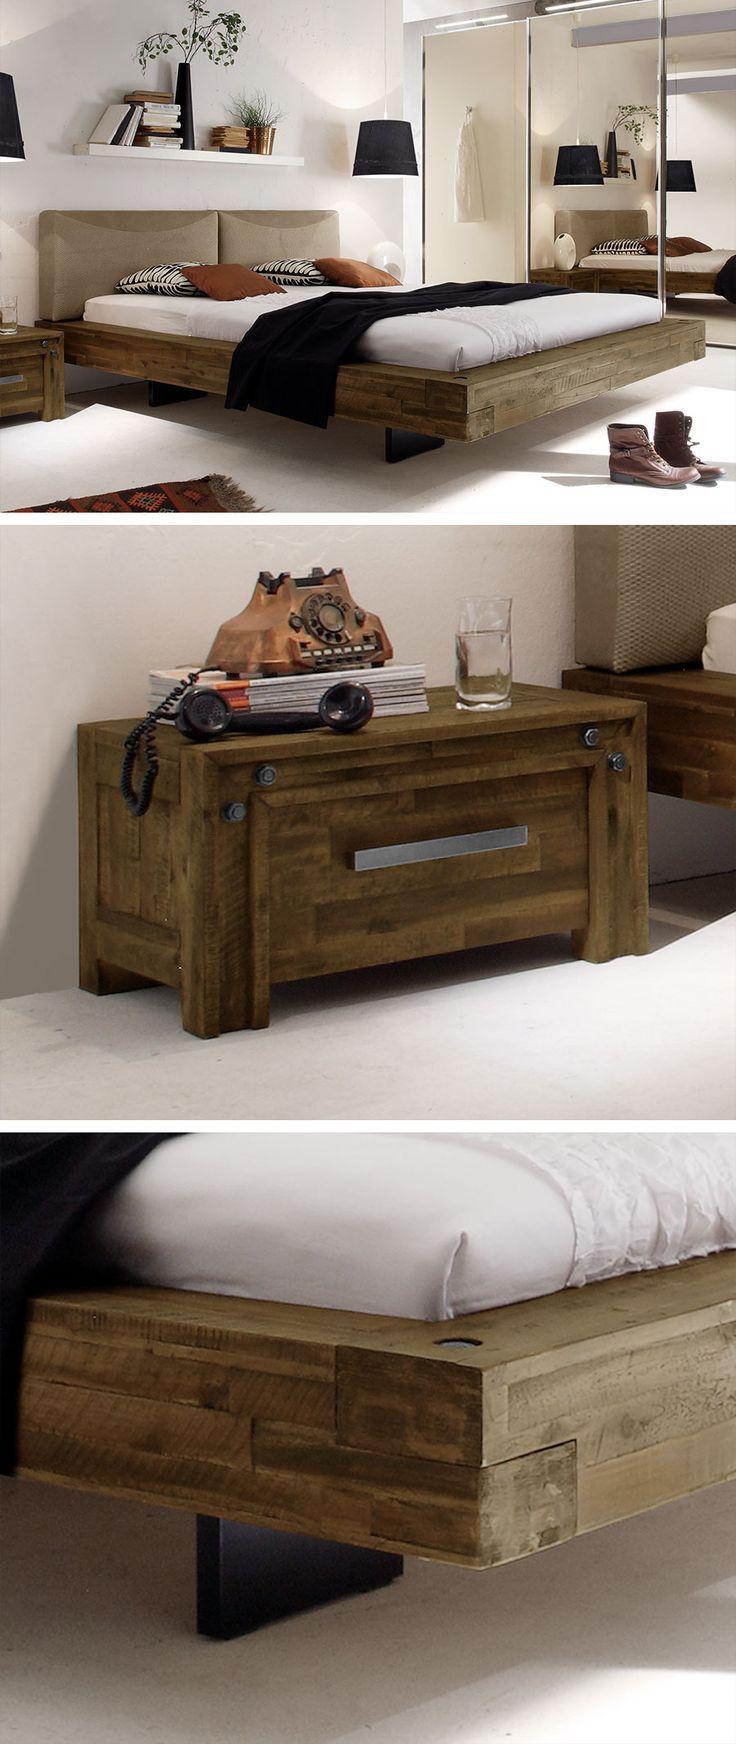 1185 best Decor images on Pinterest Bedroom ideas